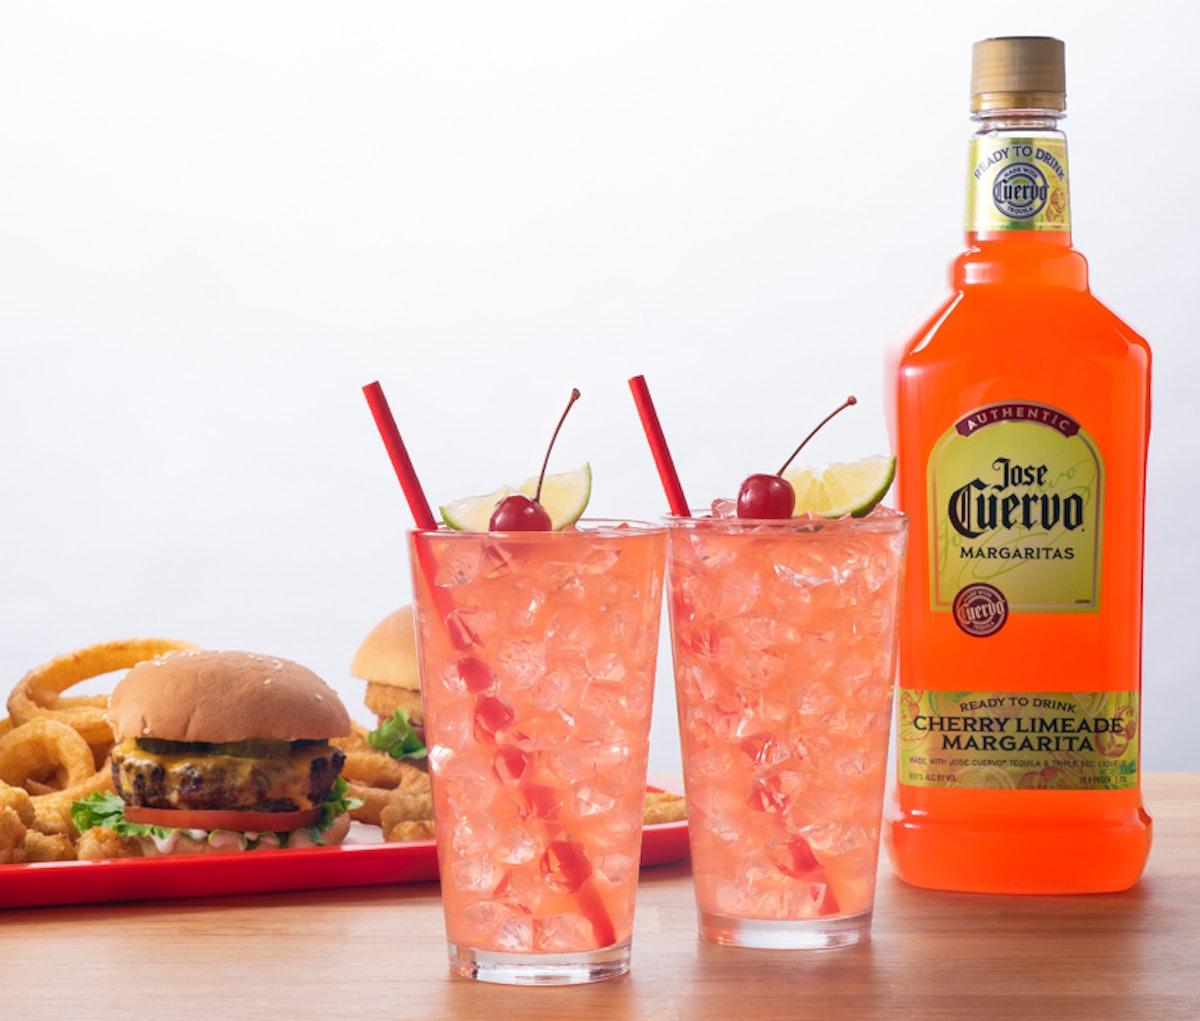 Jose Cuervo's New Cherry Limeade Margarita is a refreshing sip.